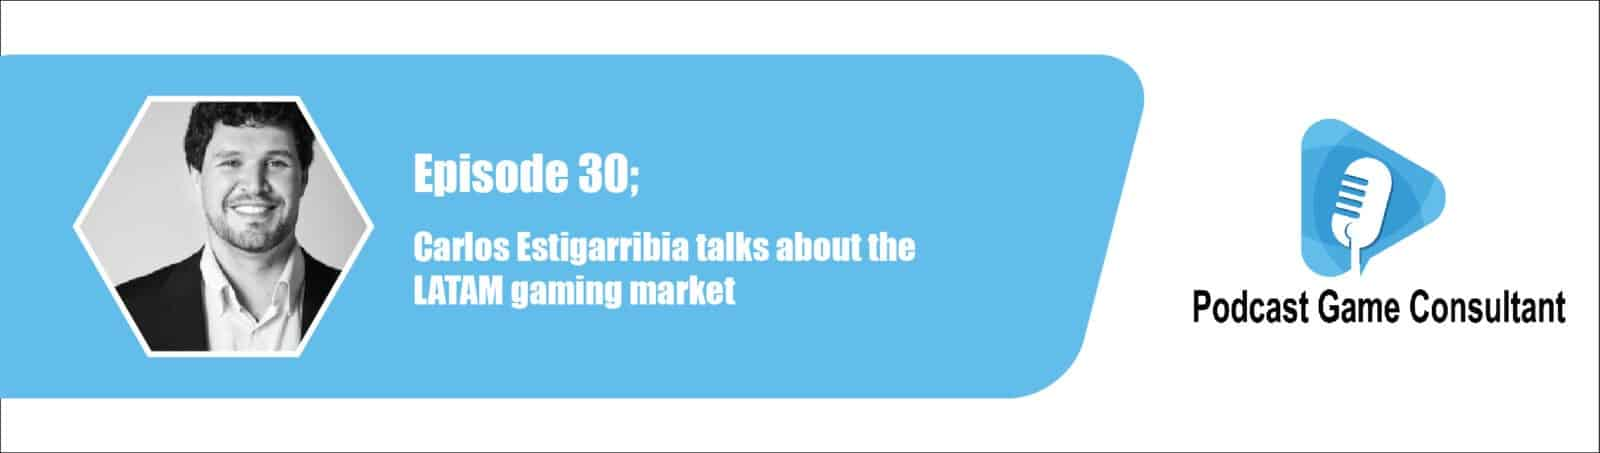 Carlos Estigarribia Talks About Gaming in Latin America